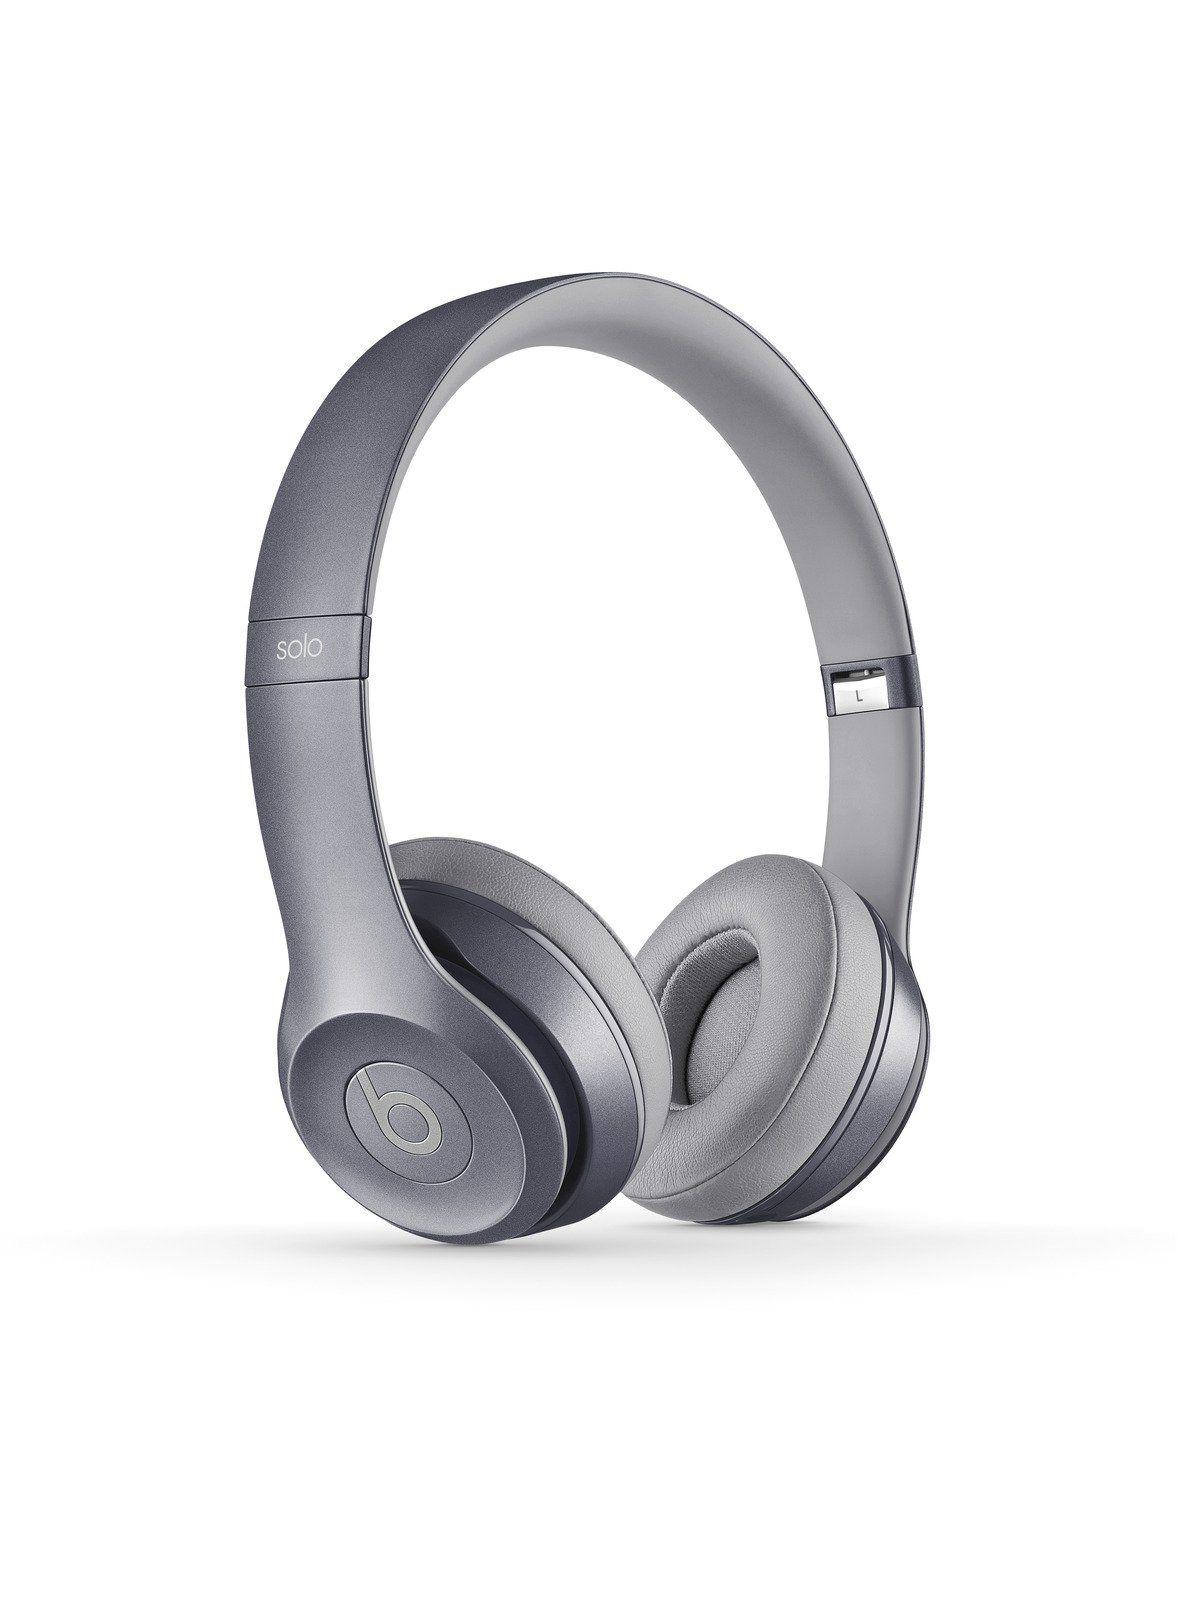 Amazon.com: Beats Solo 2 Wired On-Ear Headphone - Grey: Electronics